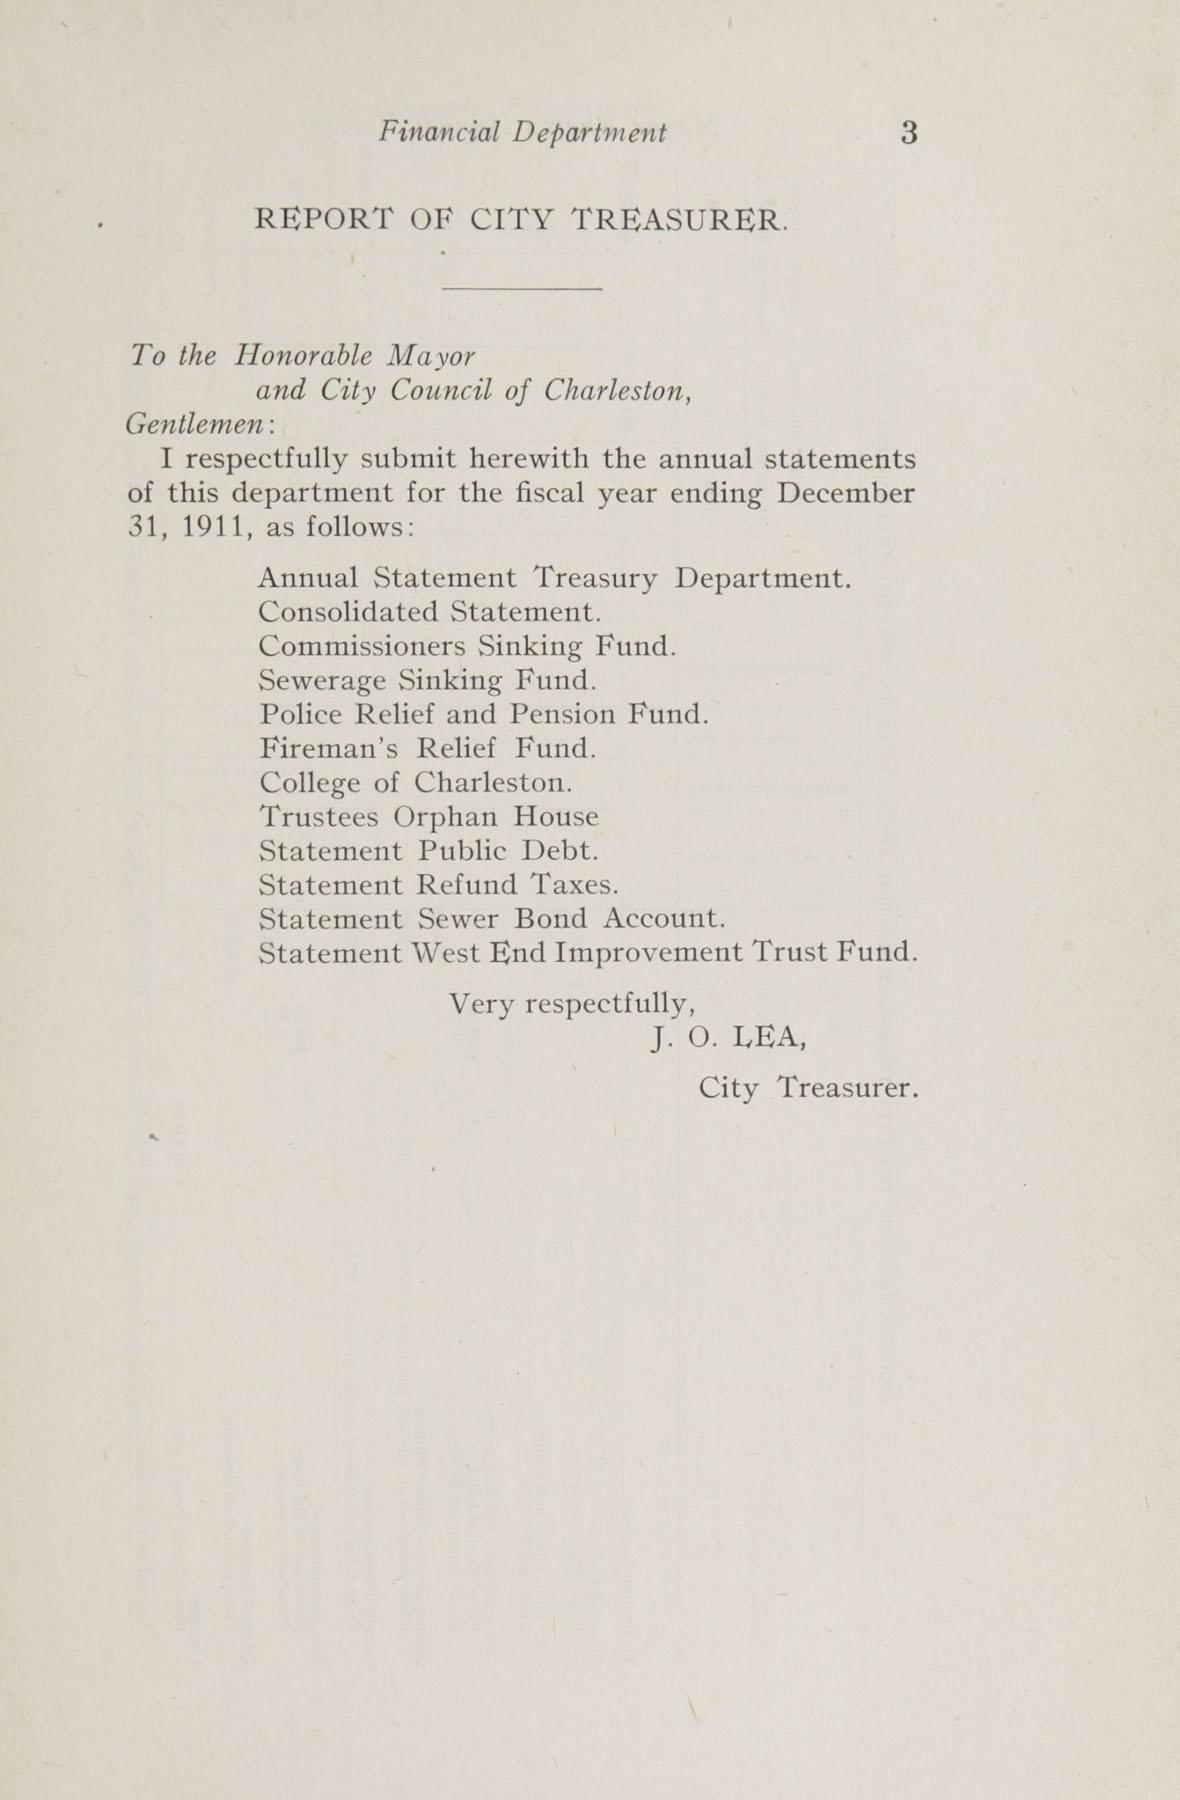 Charleston Yearbook, 1911, page 3